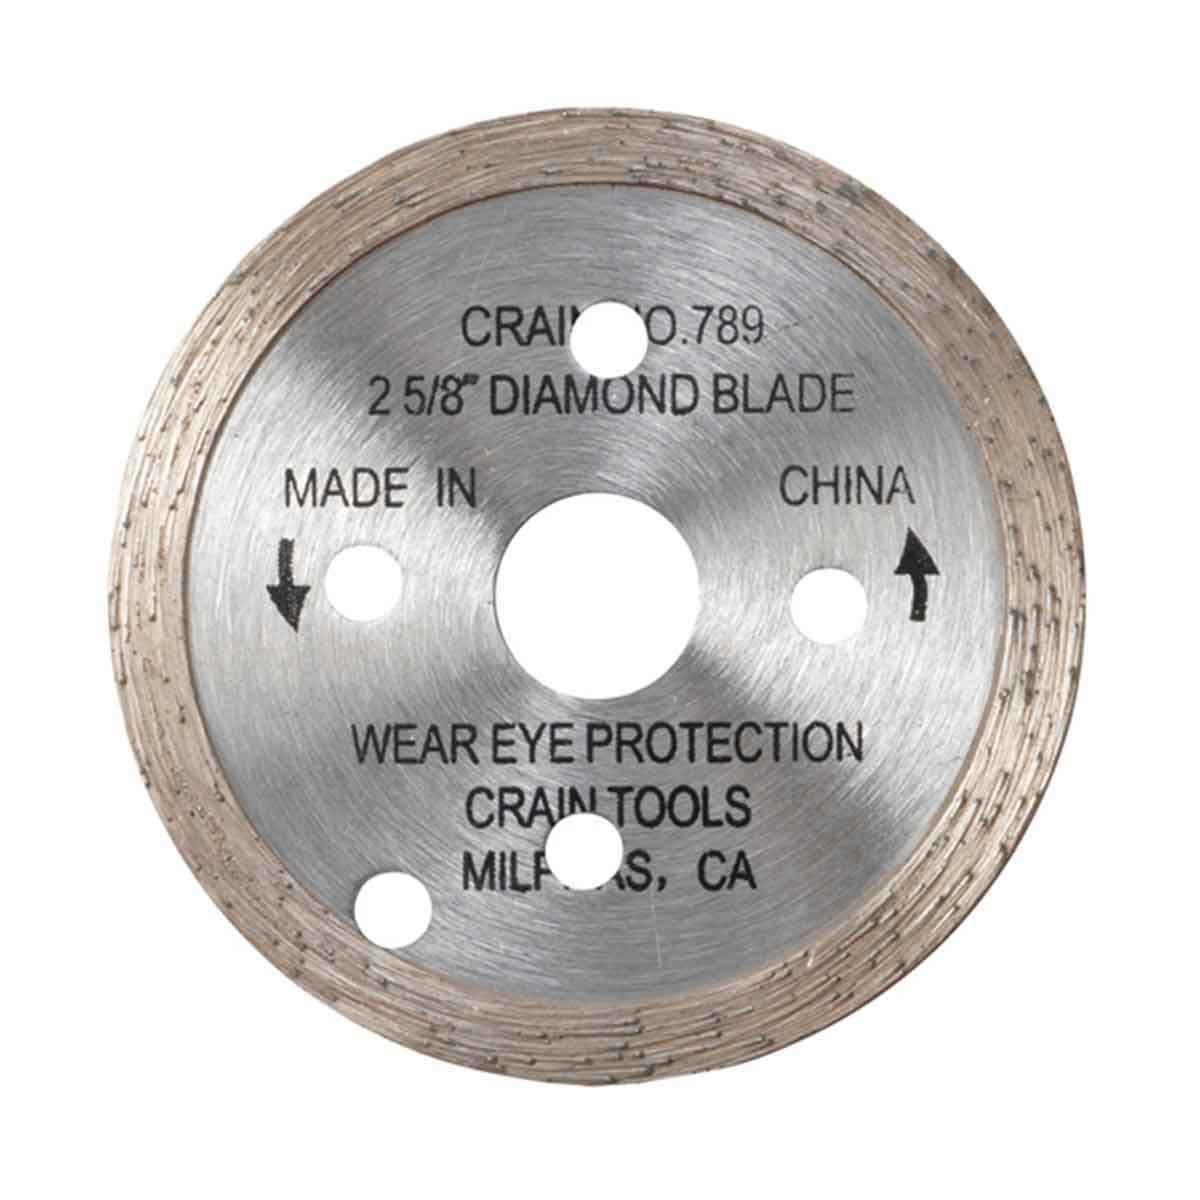 Crain 789 2 5 8 Quot Toe Kick Saw Tile Diamond Blade